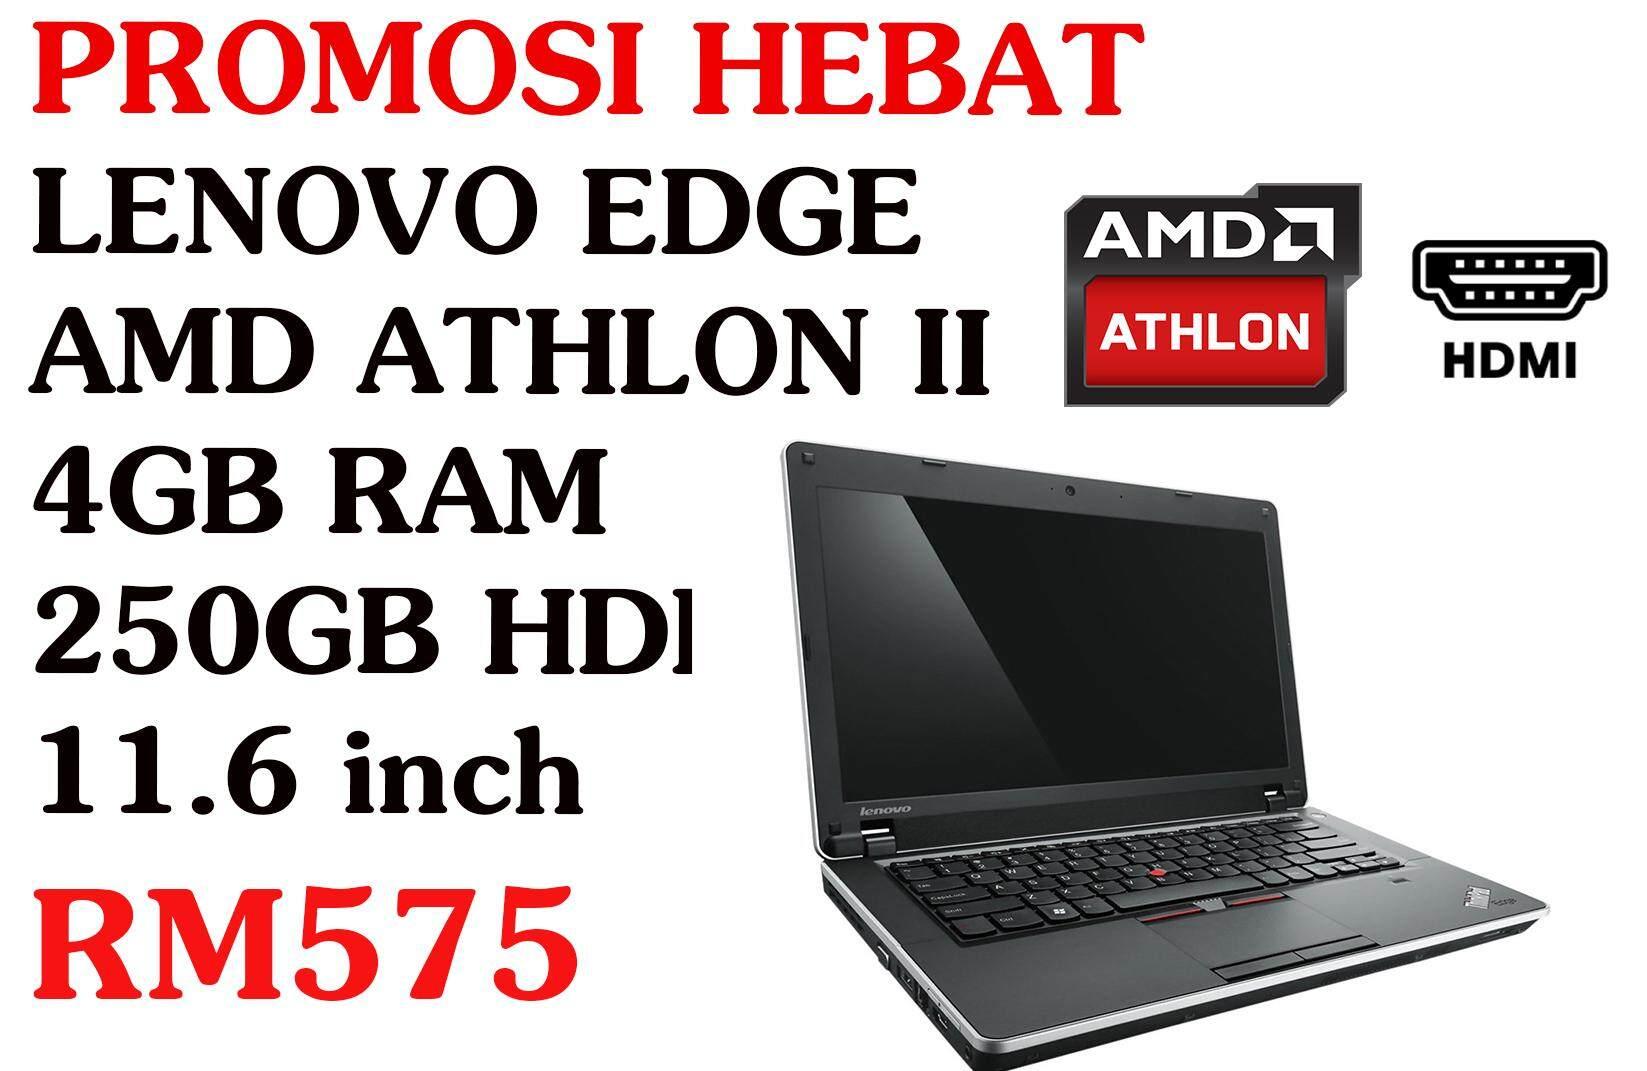 PROMOSI HEBAT LENOVO EDGE AMD ATHLON II 4GB RAM 250GB HDD 11.6 INCH Malaysia